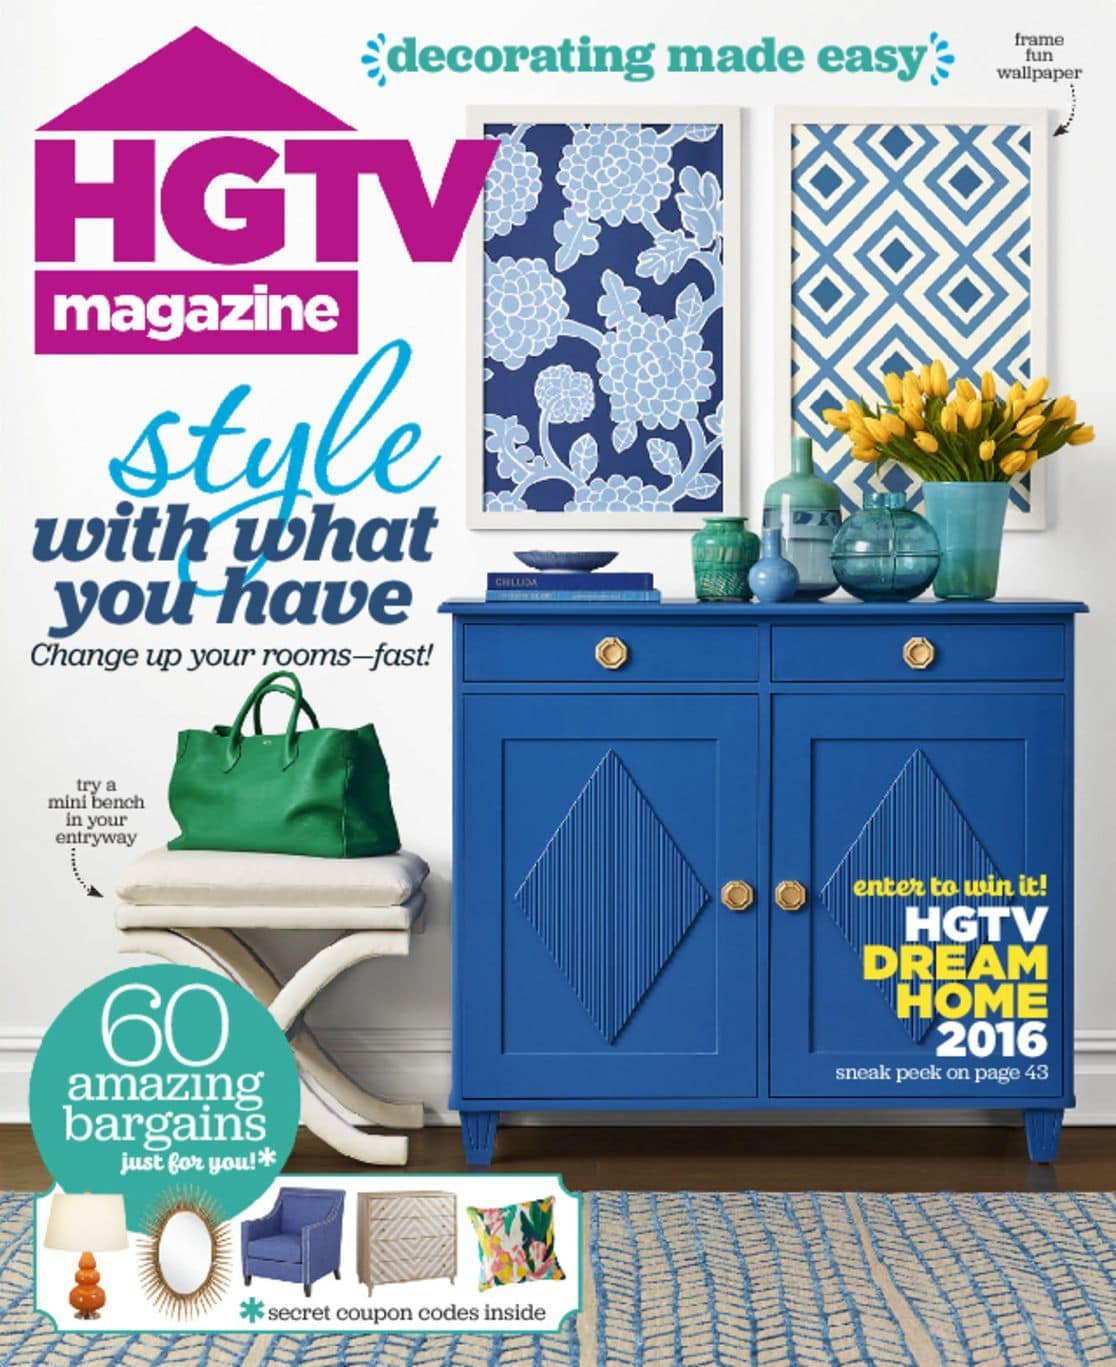 HGTV Magazine on Sale